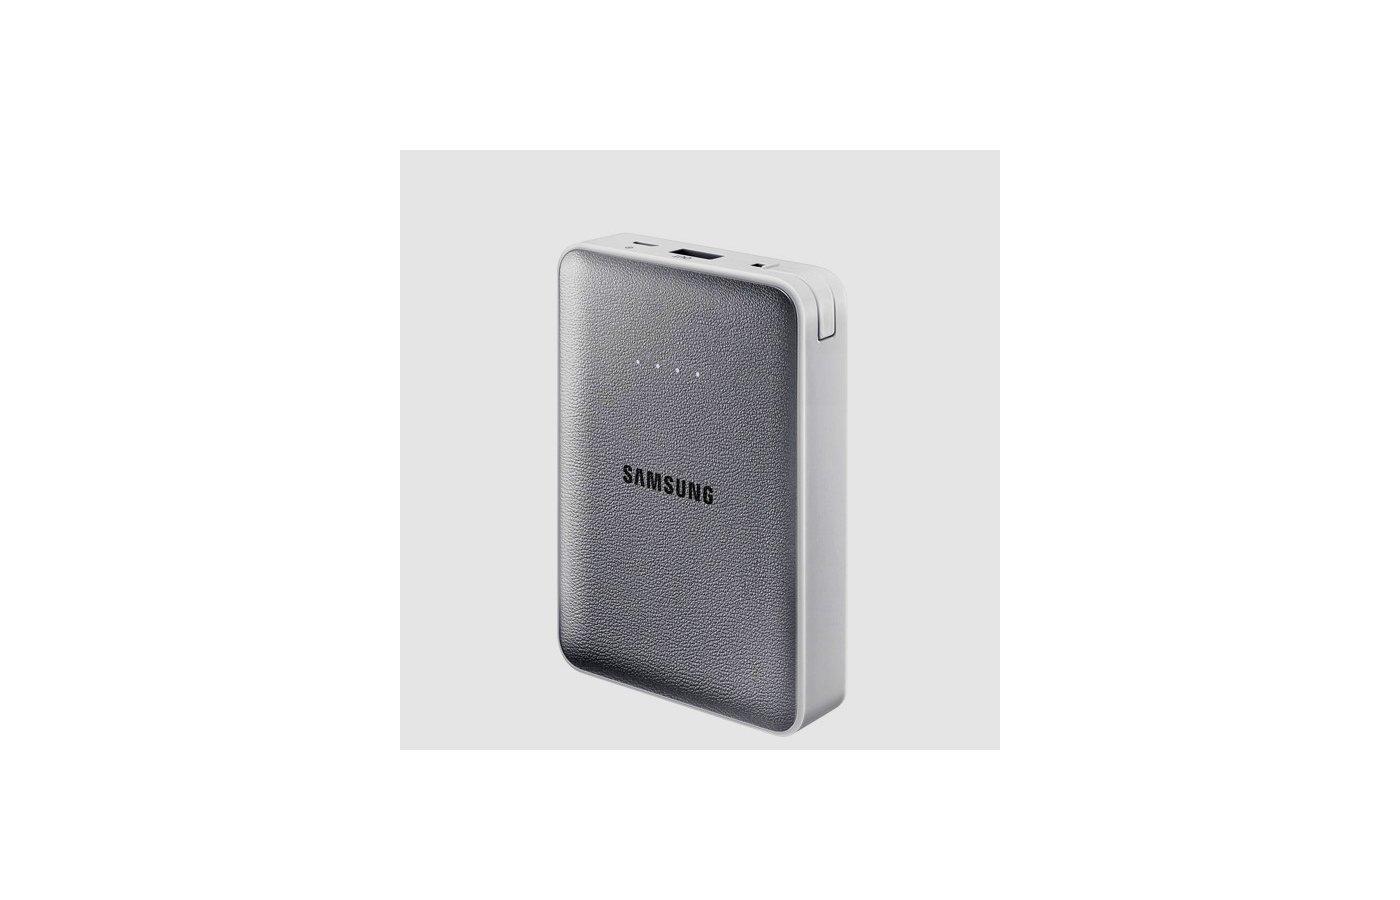 Портативный аккумулятор Samsung EB-PG850 8.4mAh серый (EB-PG850BSRGRU)